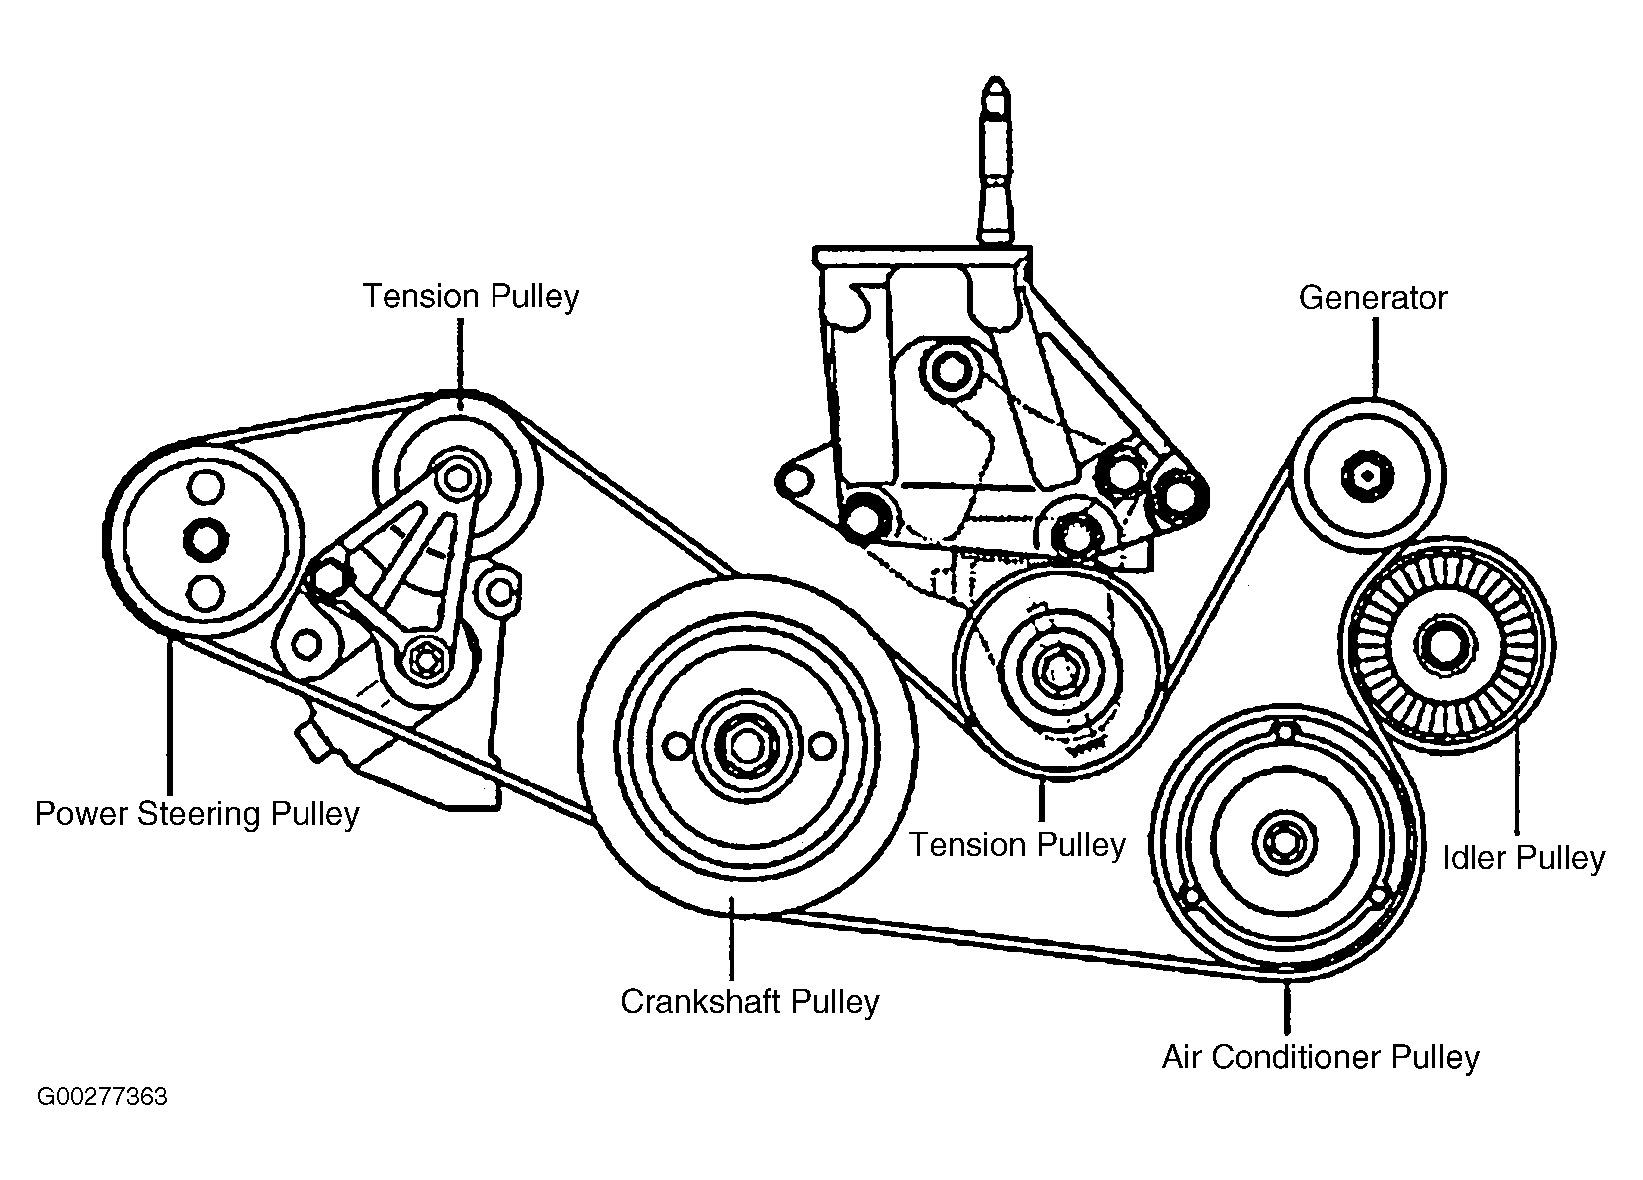 hight resolution of 2005 hyundai xg350 engine diagram wiring diagram sheet 2003 hyundai xg350 engine diagram 2005 hyundai xg350